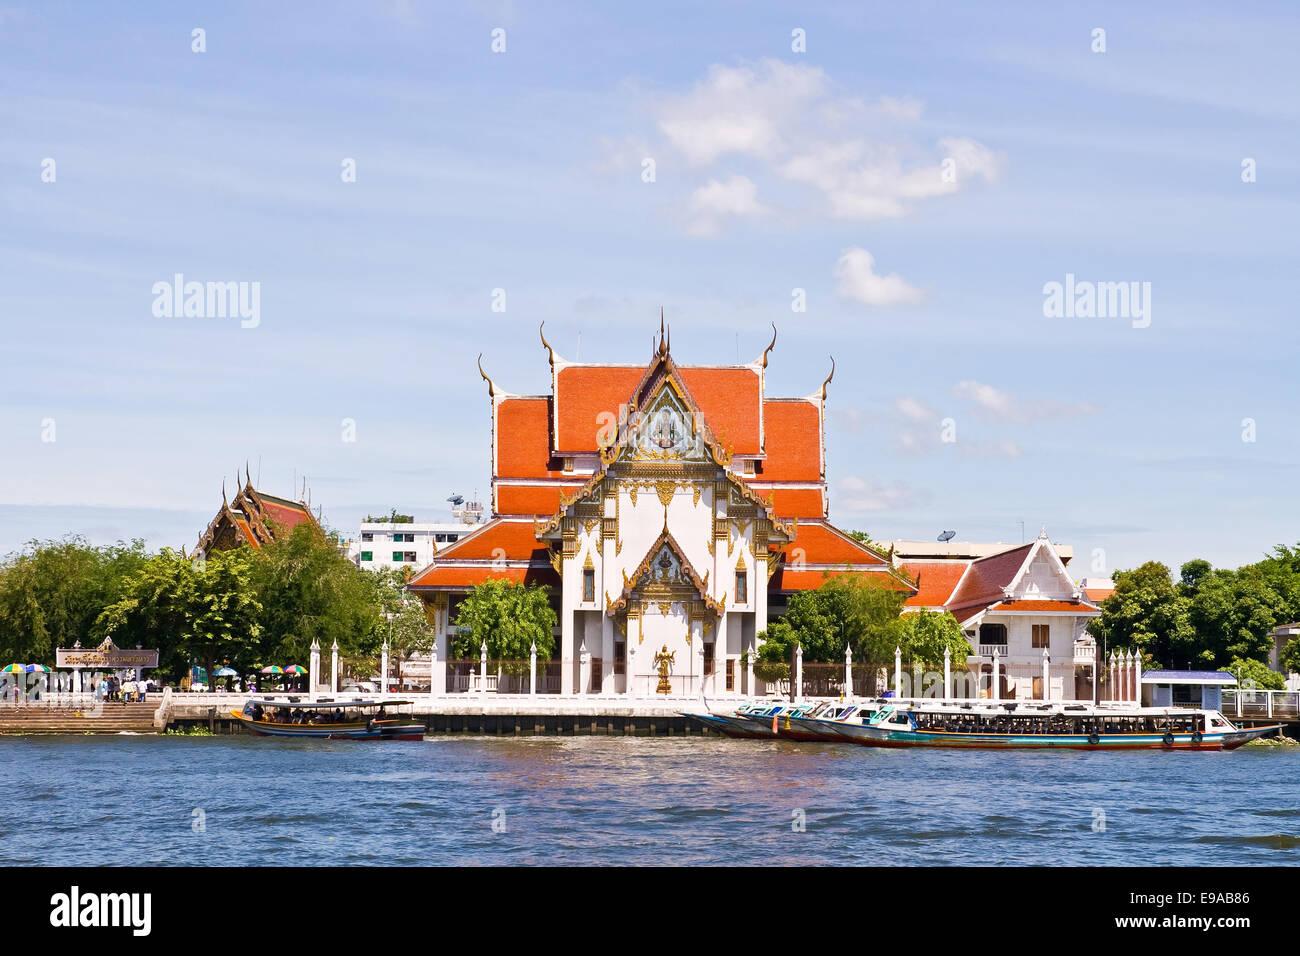 Wat Rakang, Thai Temple on the River. - Stock Image